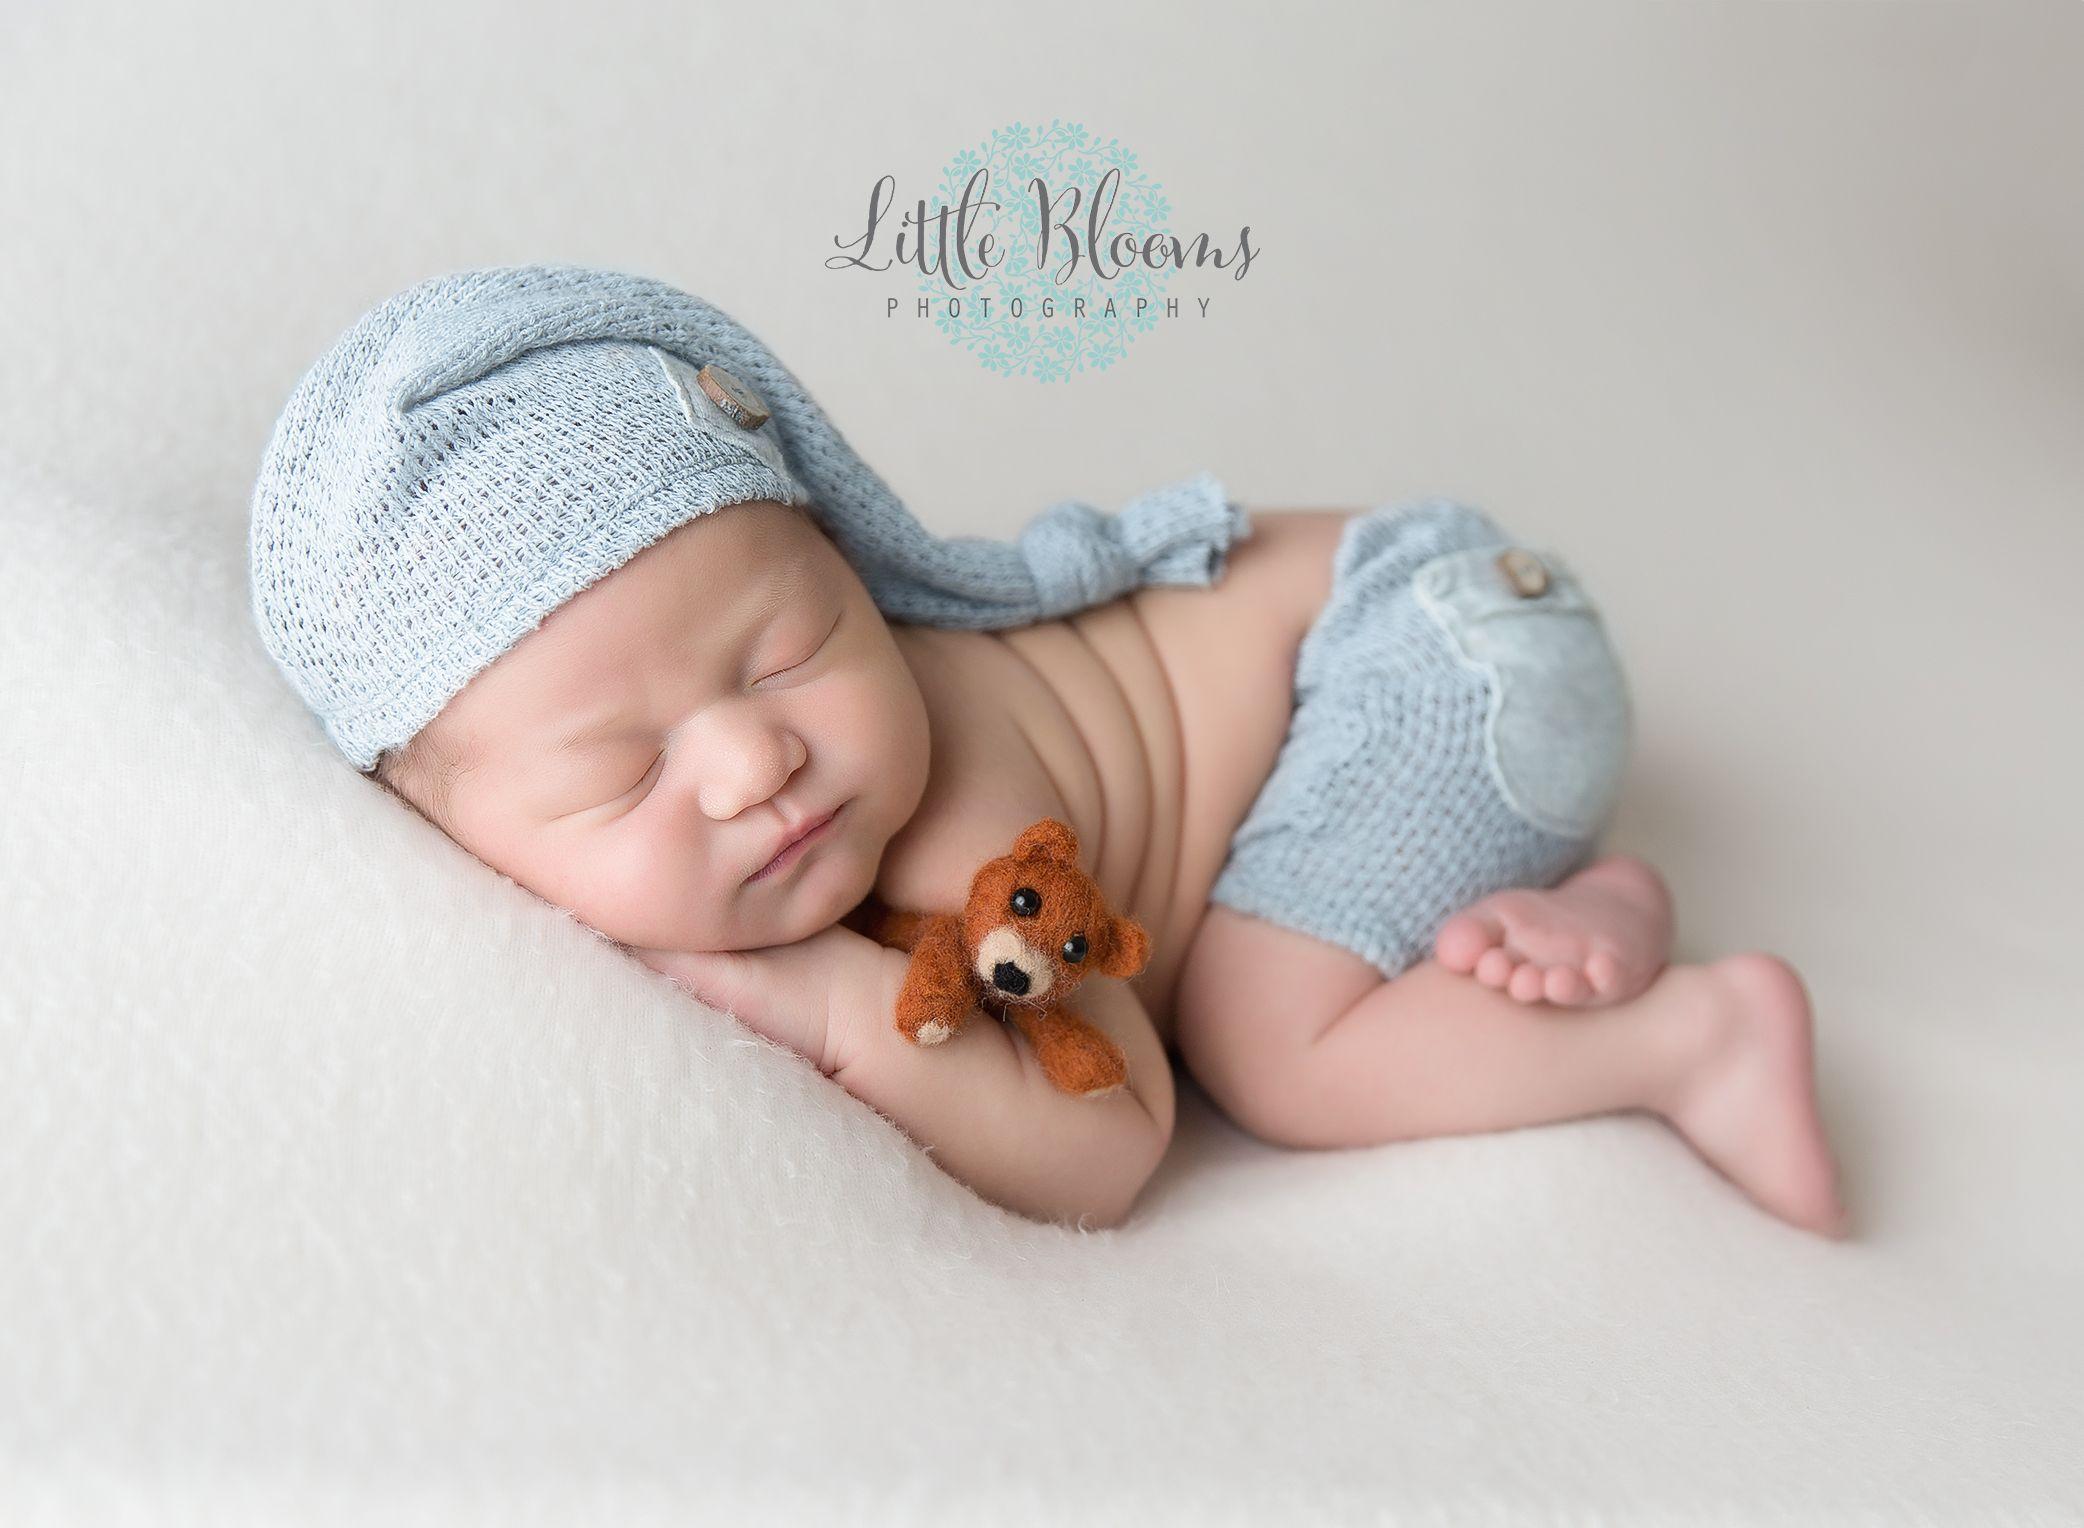 Newborn baby boy sleeping 77cc1df29c52